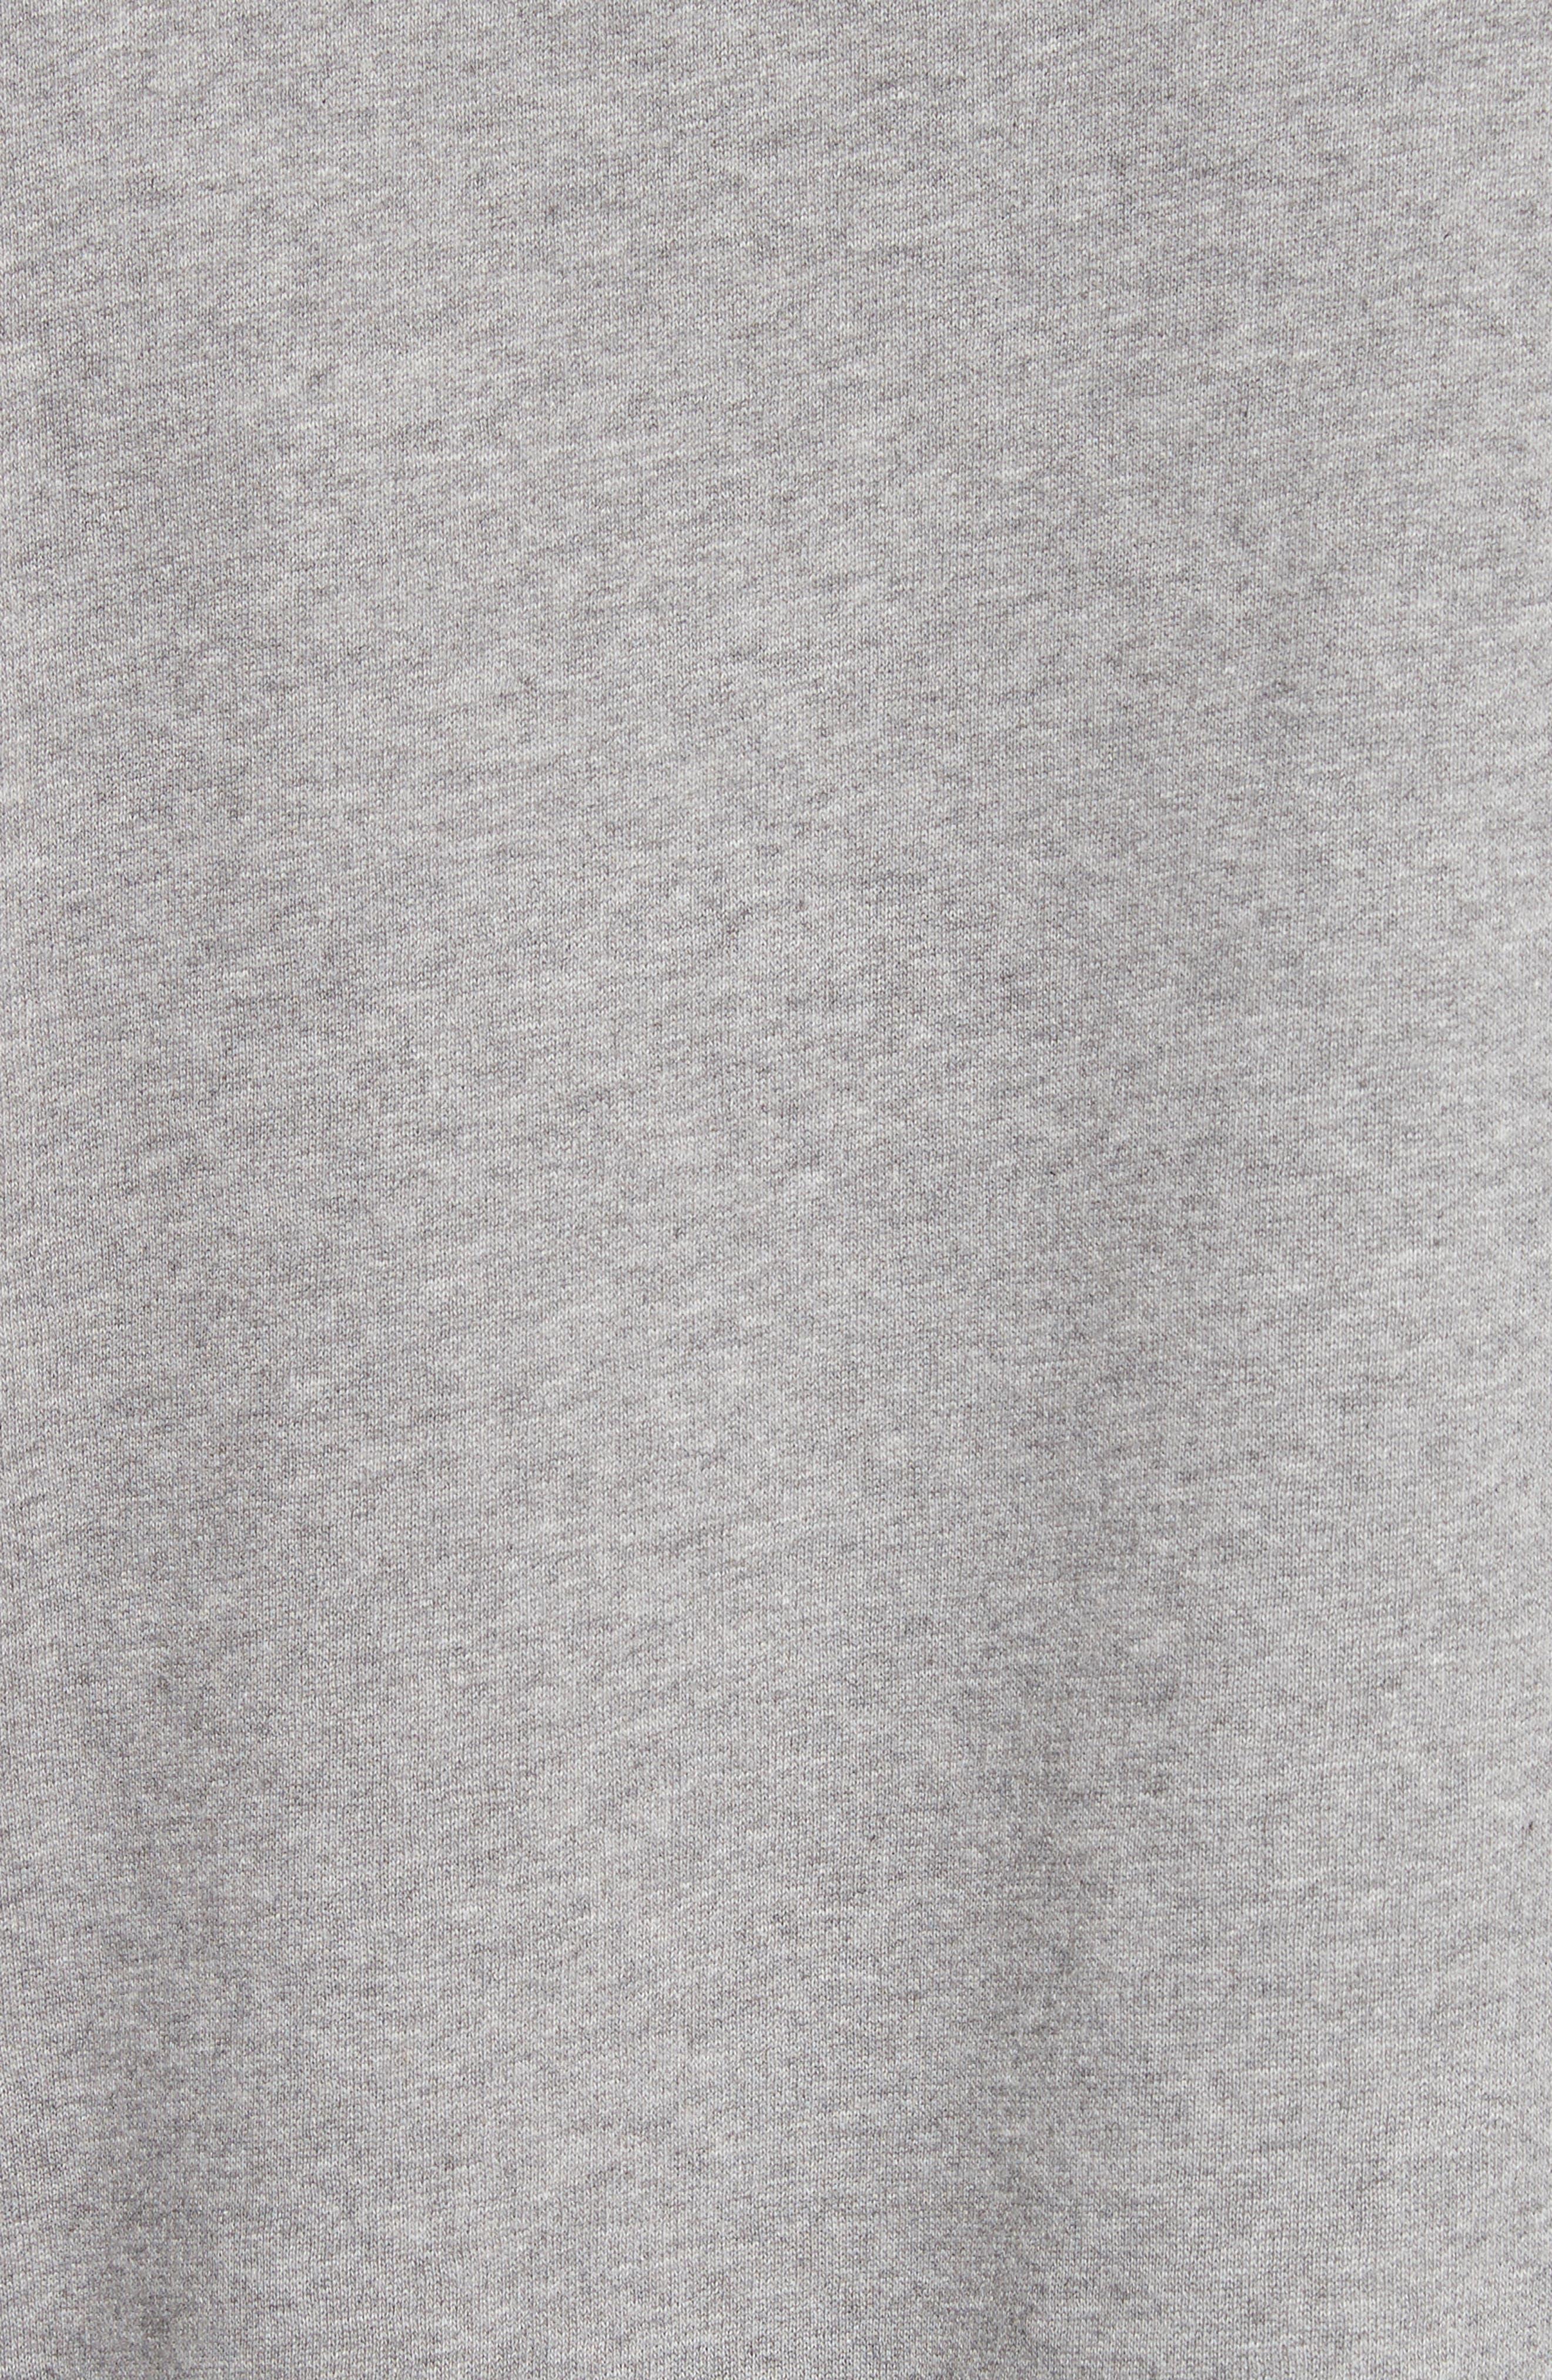 Flogo Oversize Cotton Sweatshirt,                             Alternate thumbnail 5, color,                             LIGHT GREY MELANGE